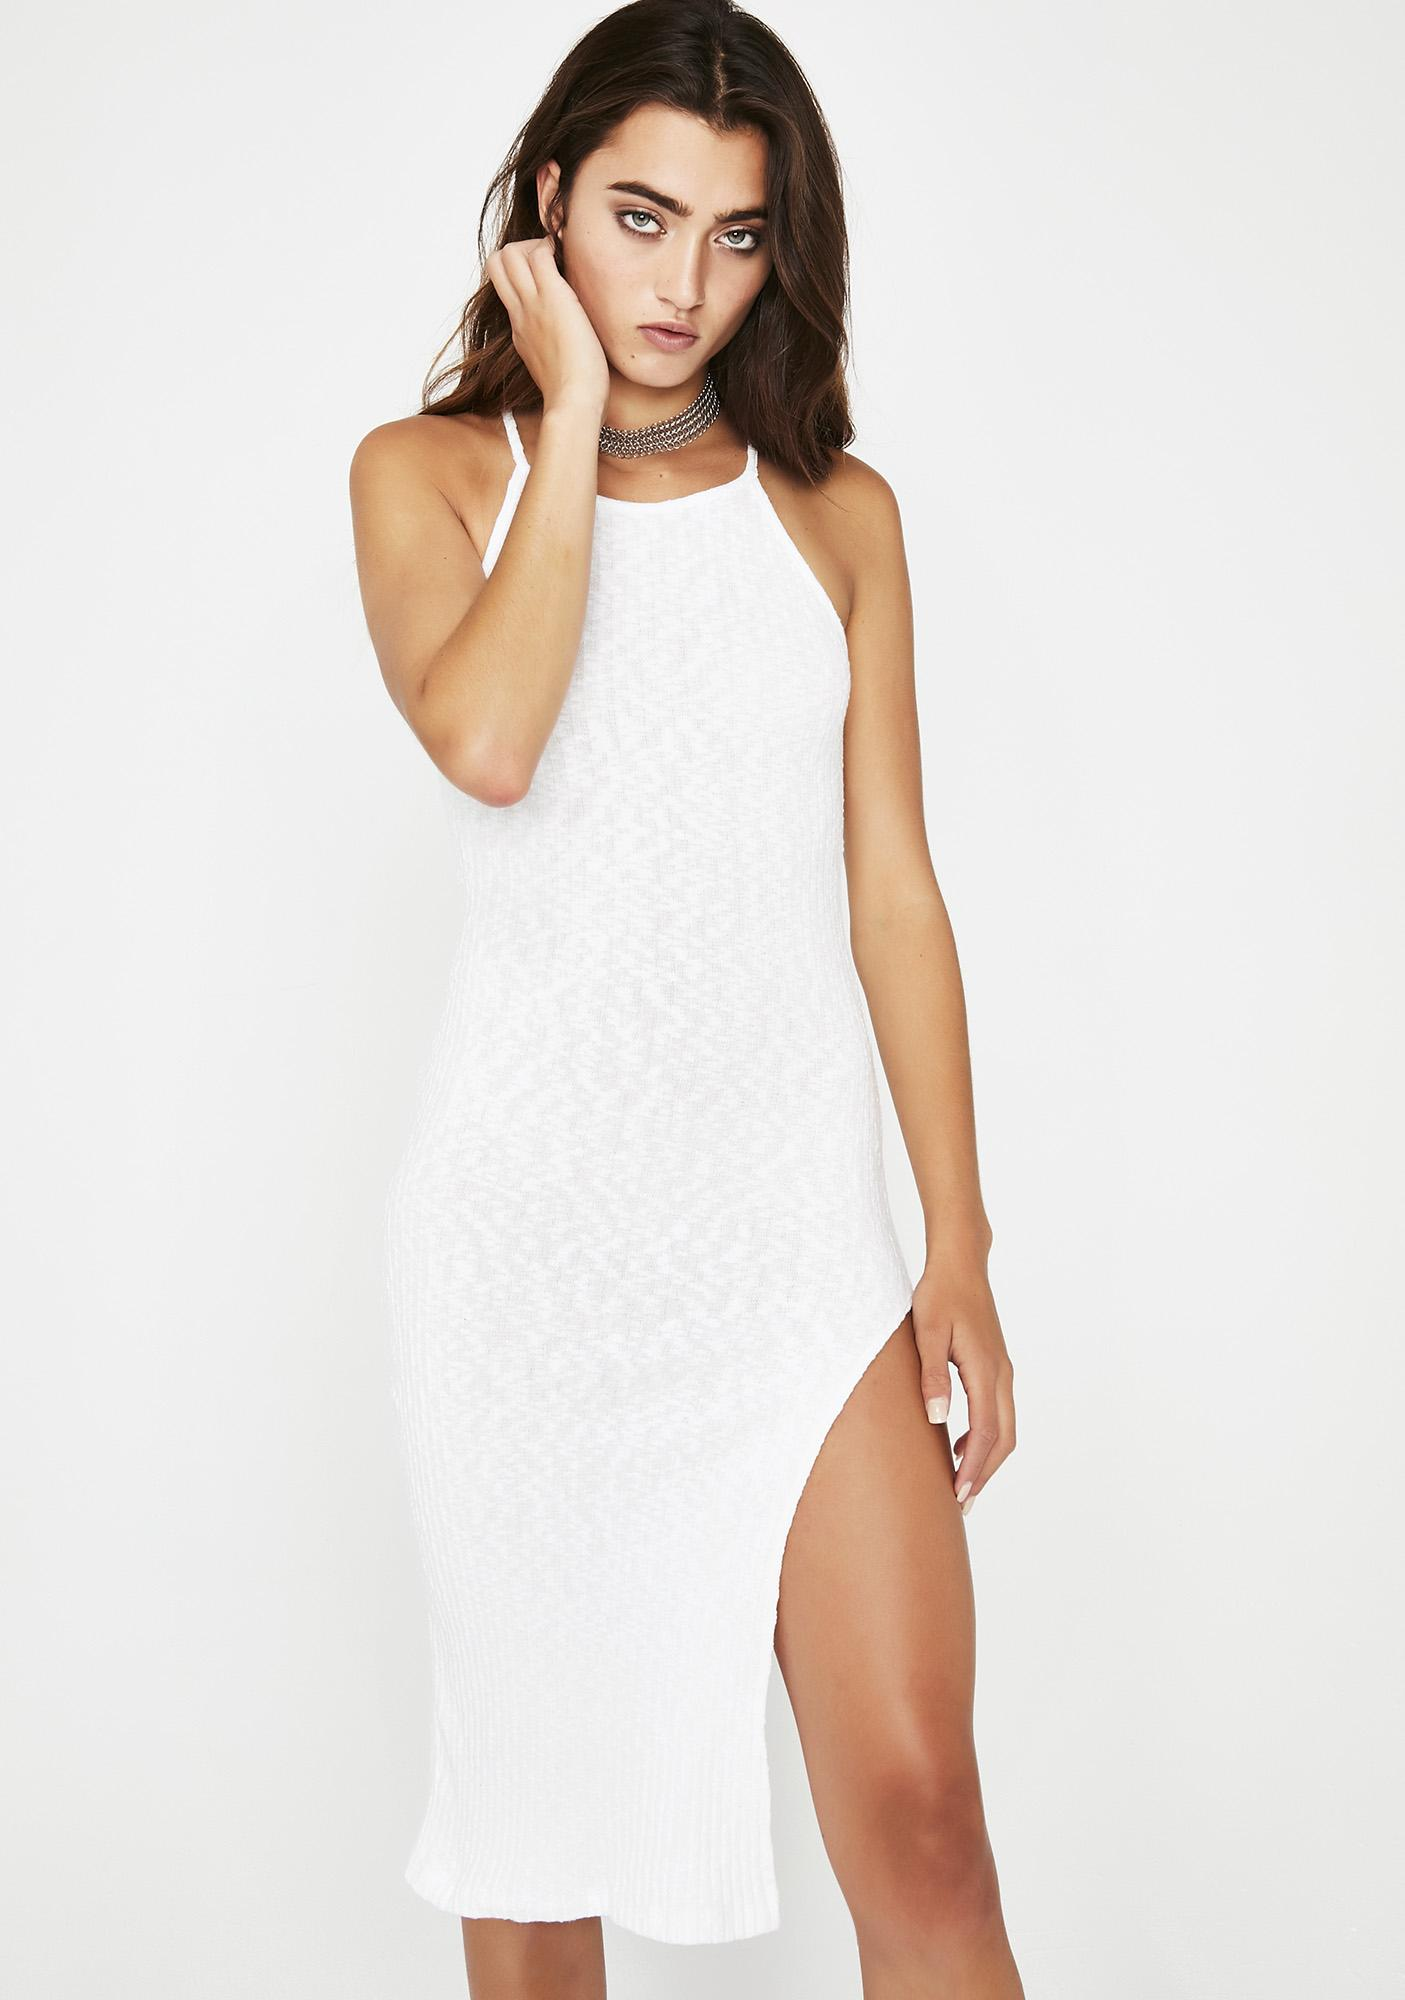 Talk About It Knit Dress